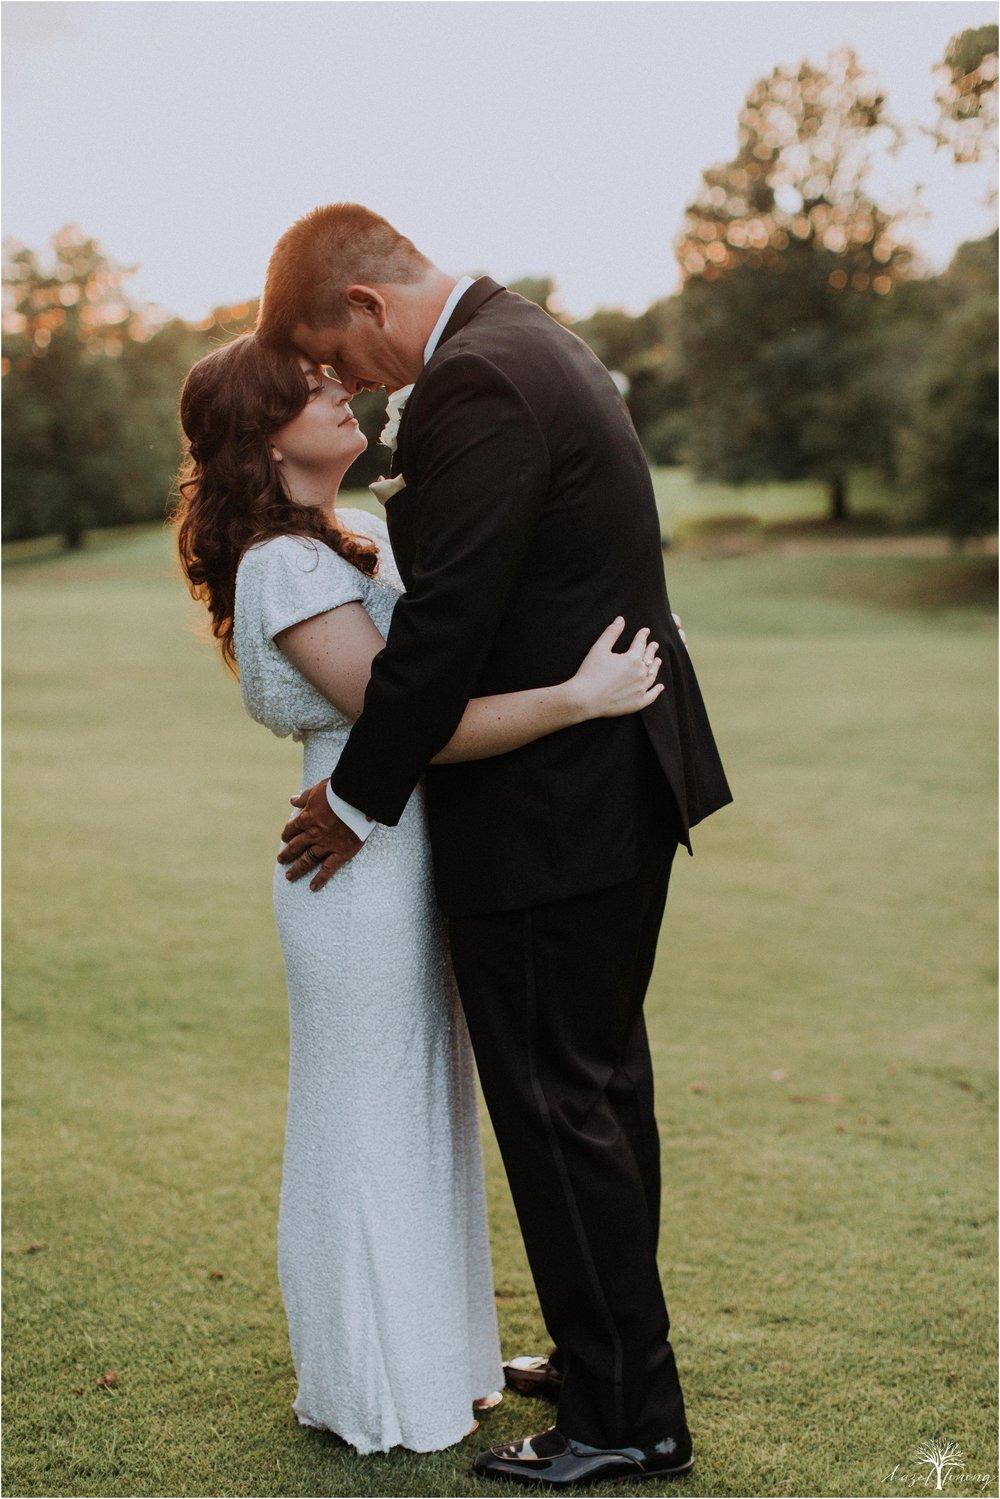 elizabeth-doelp-andrew-foreback-middletown-country-club-summer-langhorne-pennsylvania-wedding-hazel-lining-travel-wedding-elopement-photography_0170.jpg